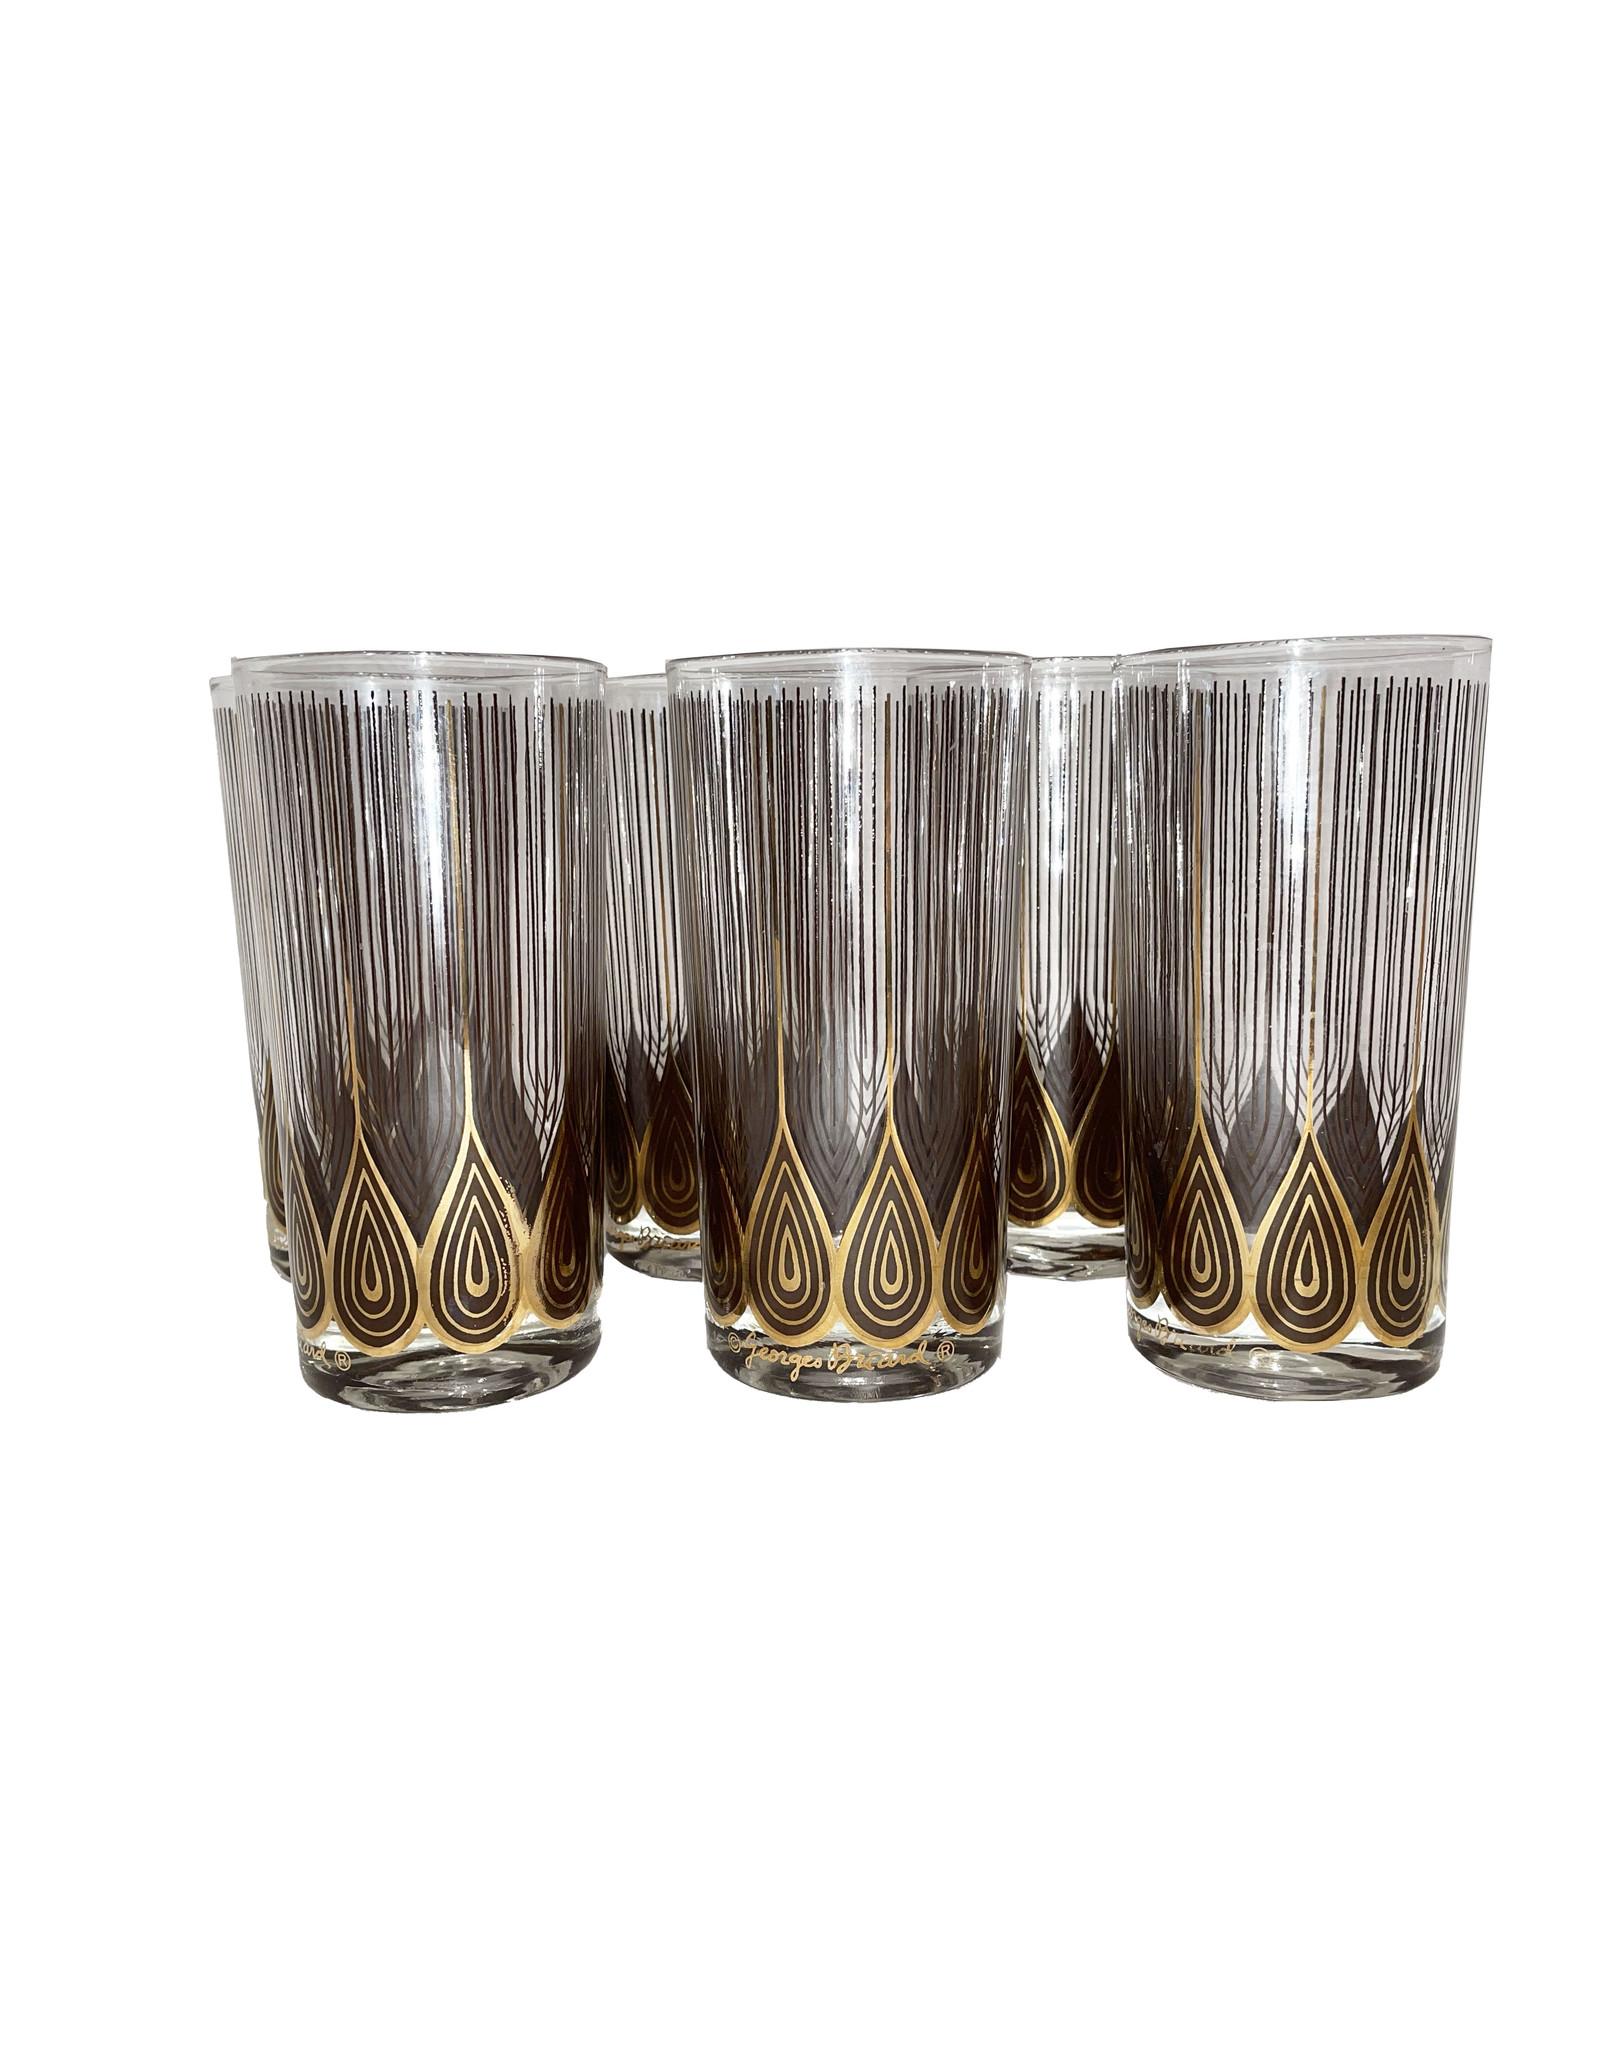 Vintage George Briard Highball Glasses- Set of 12